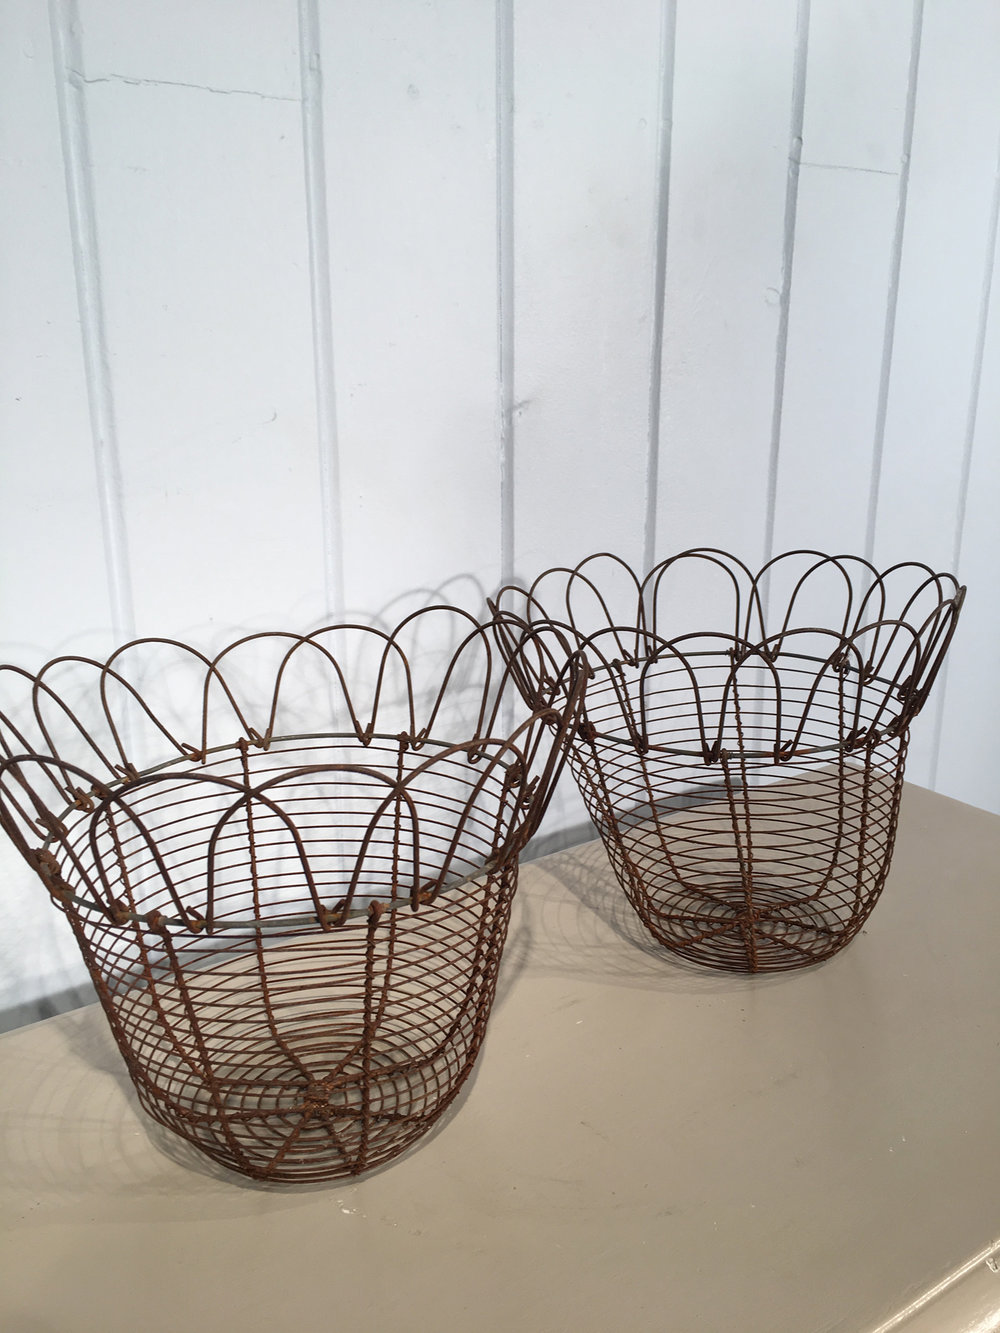 Pair of English Wire Egg Baskets — The Elemental Garden